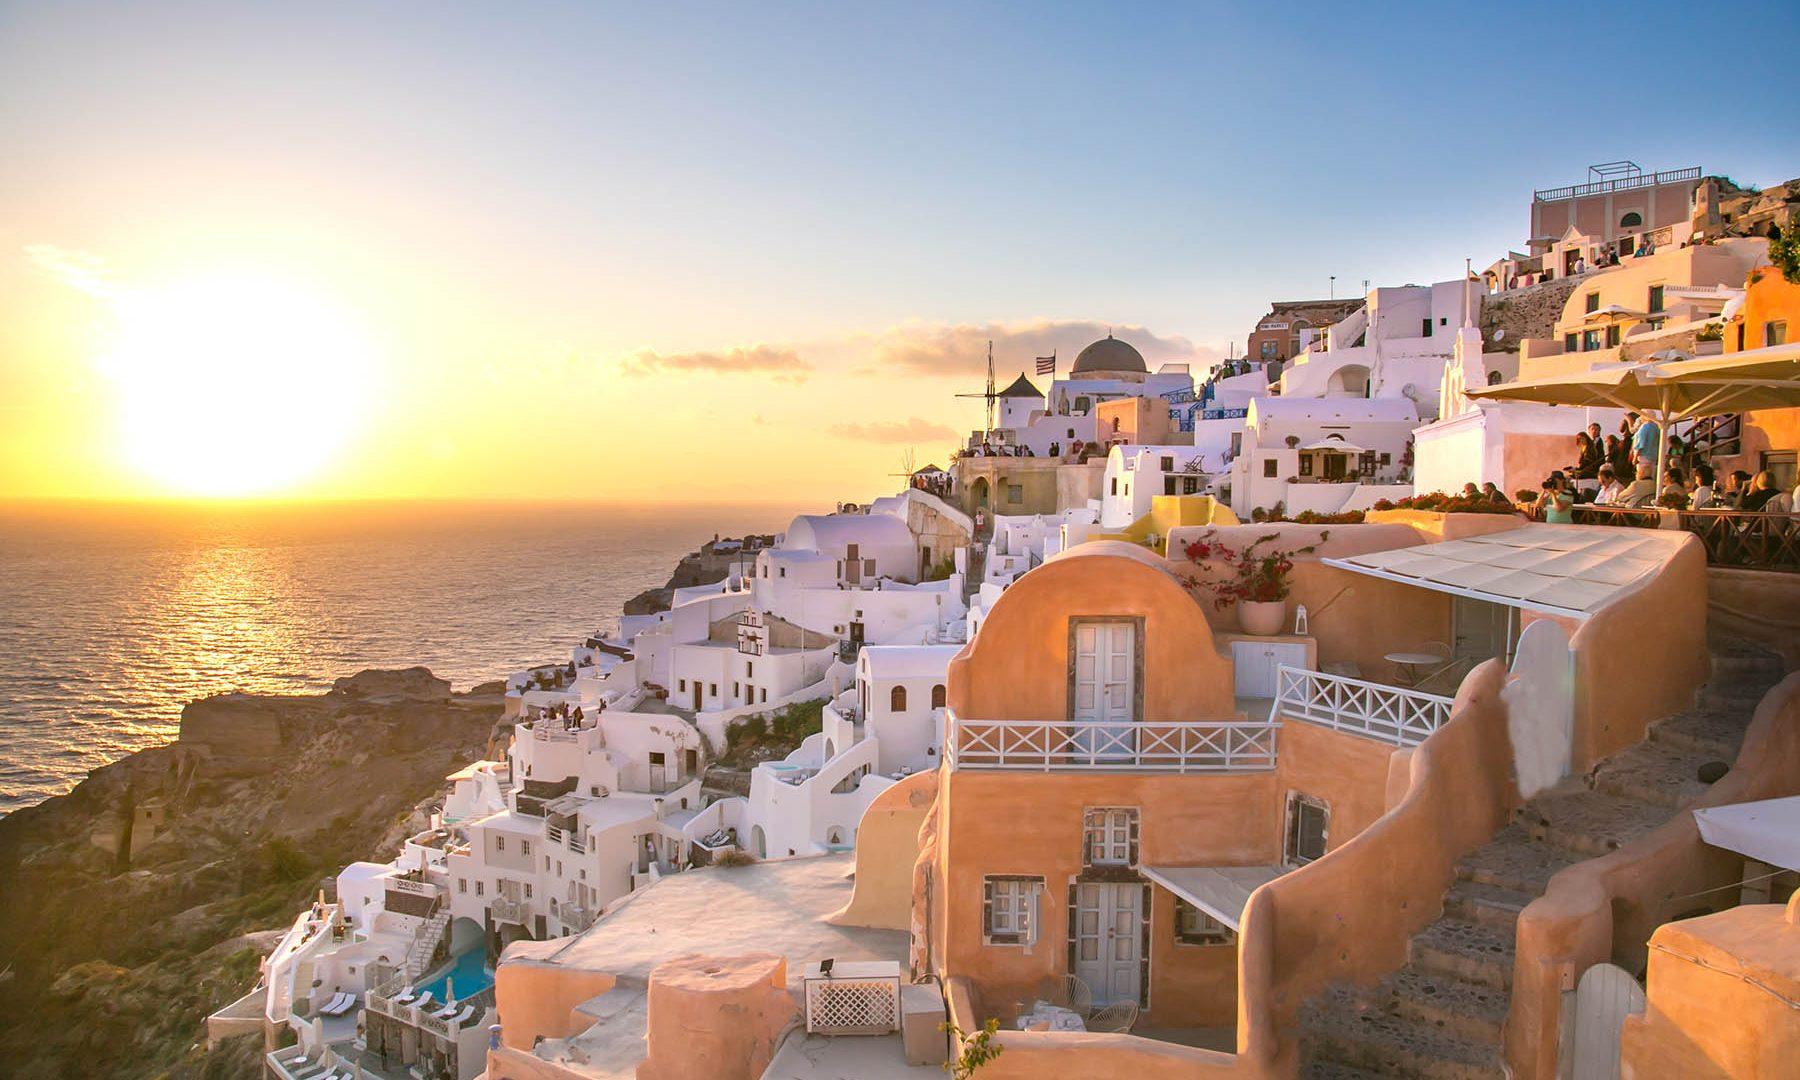 santorini greece | Kastro Oia Houses